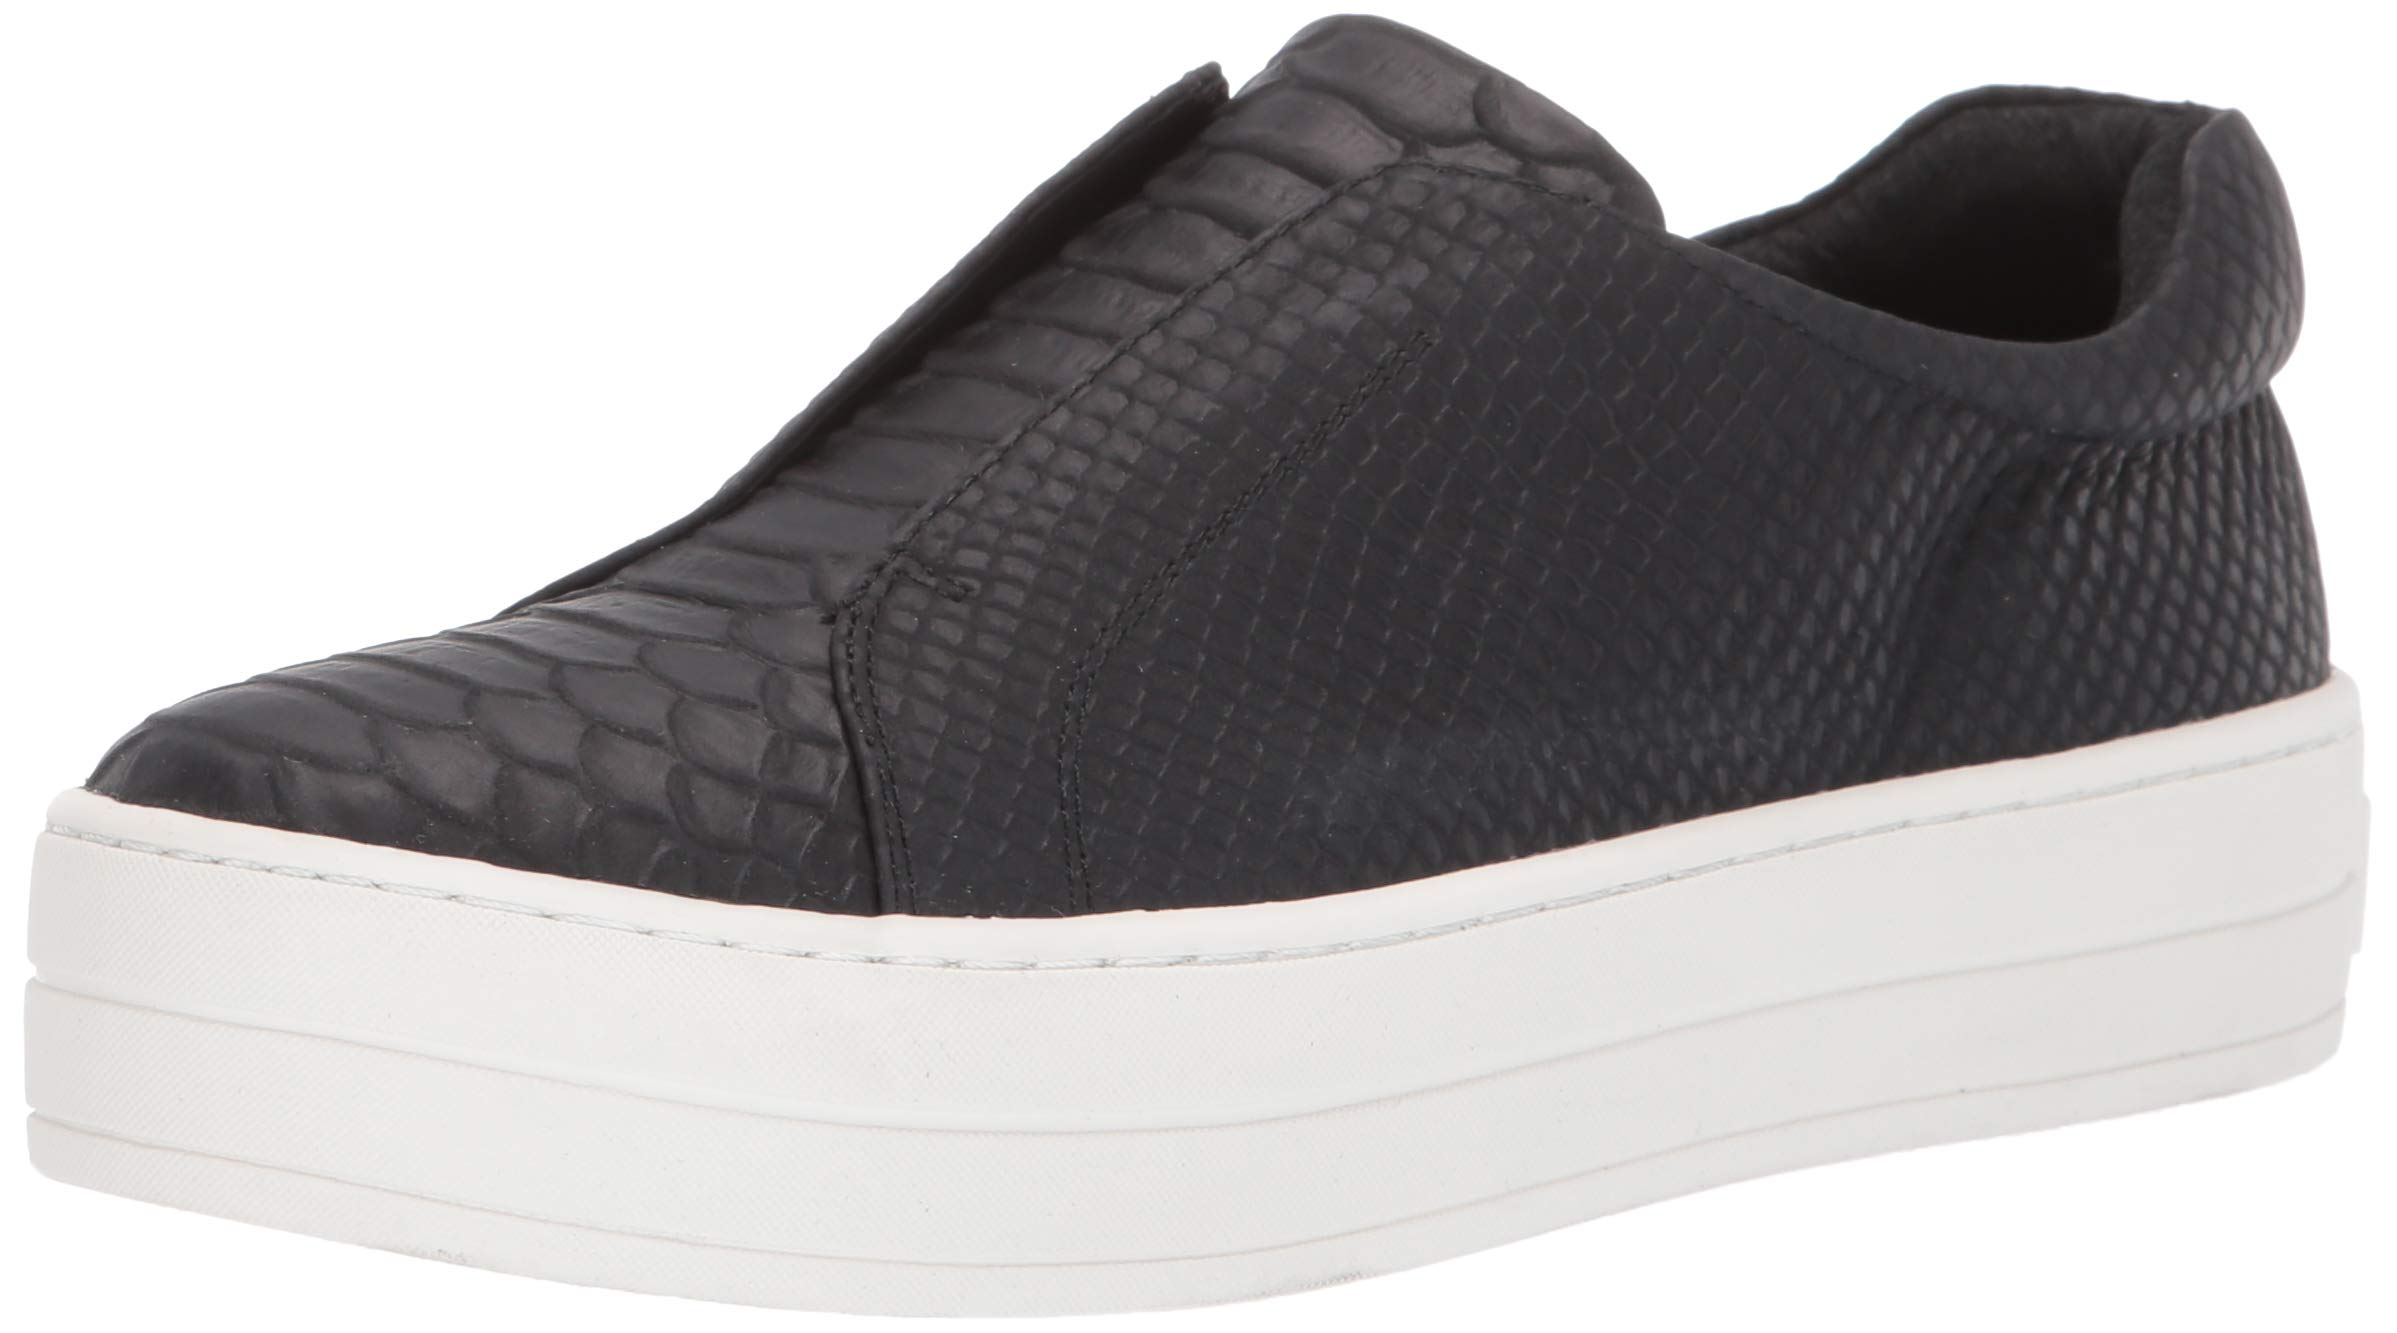 J/SLIDES JSlides Women's Heidi Shoe, Black Embossed, 10 Medium US by J/SLIDES